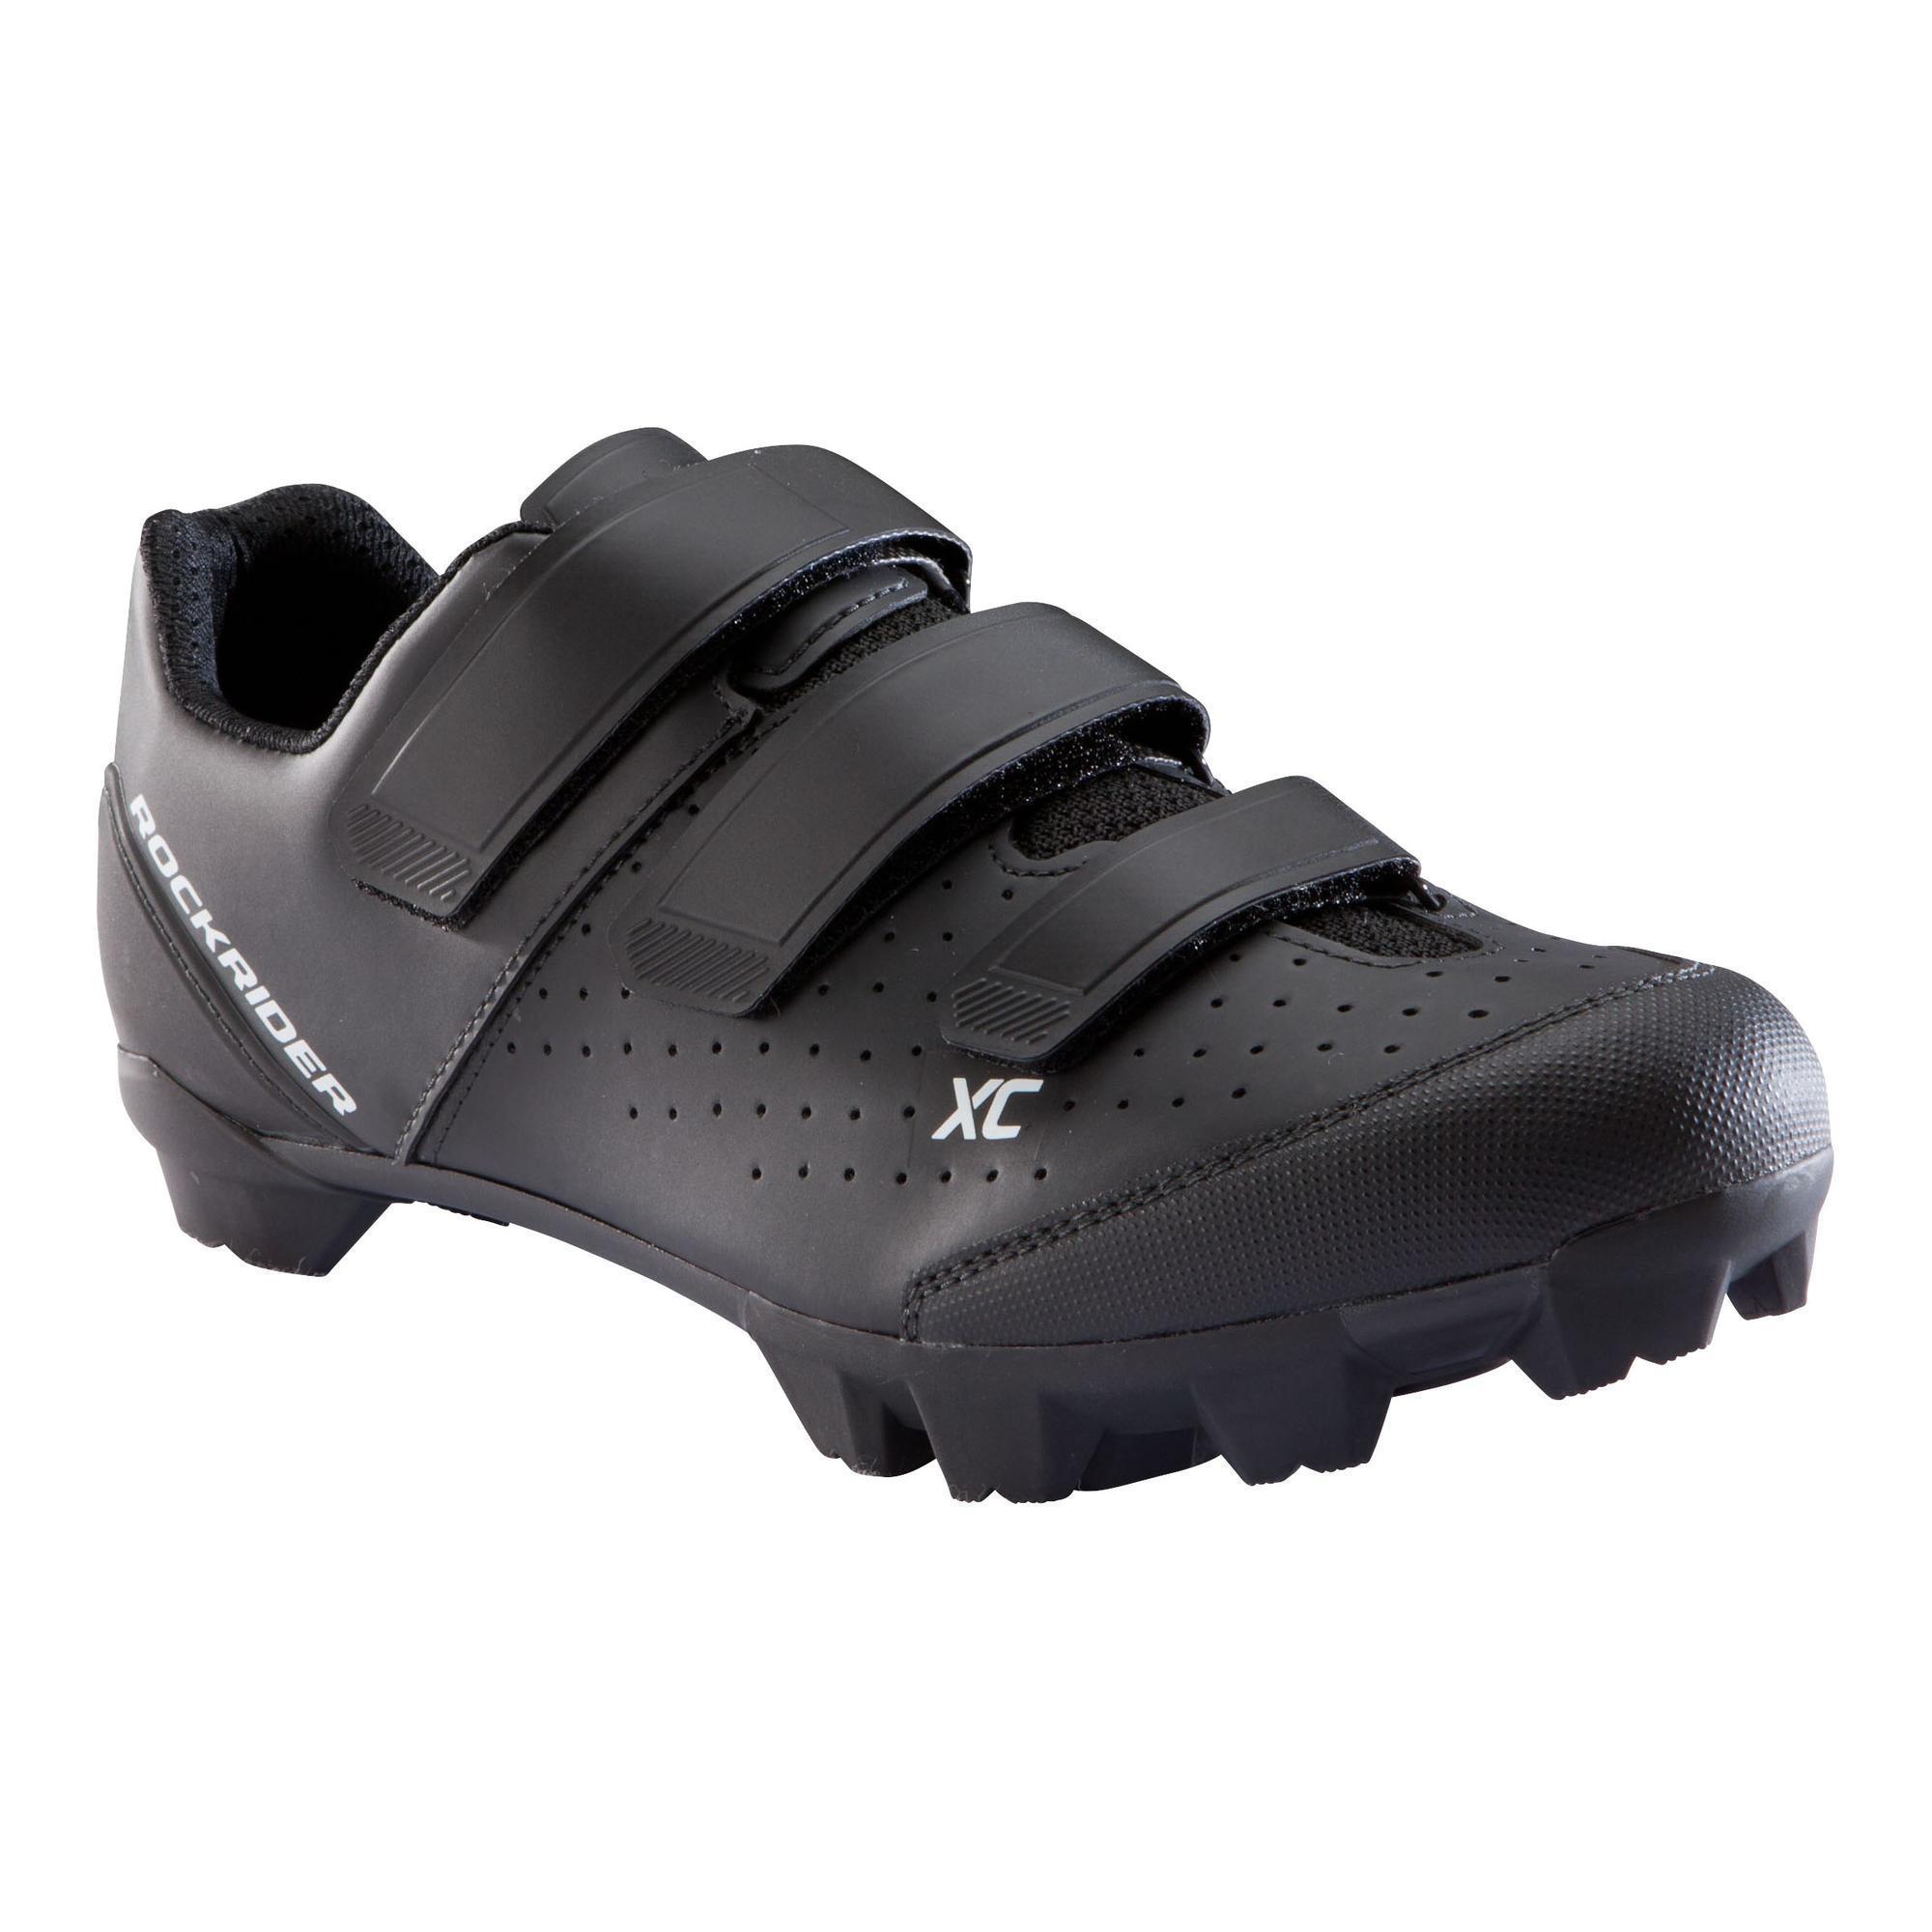 Fahrradschuhe Mountainbike XC 100 schwarz | Schuhe > Sportschuhe > Fahrradschuhe | Schwarz | Rockrider